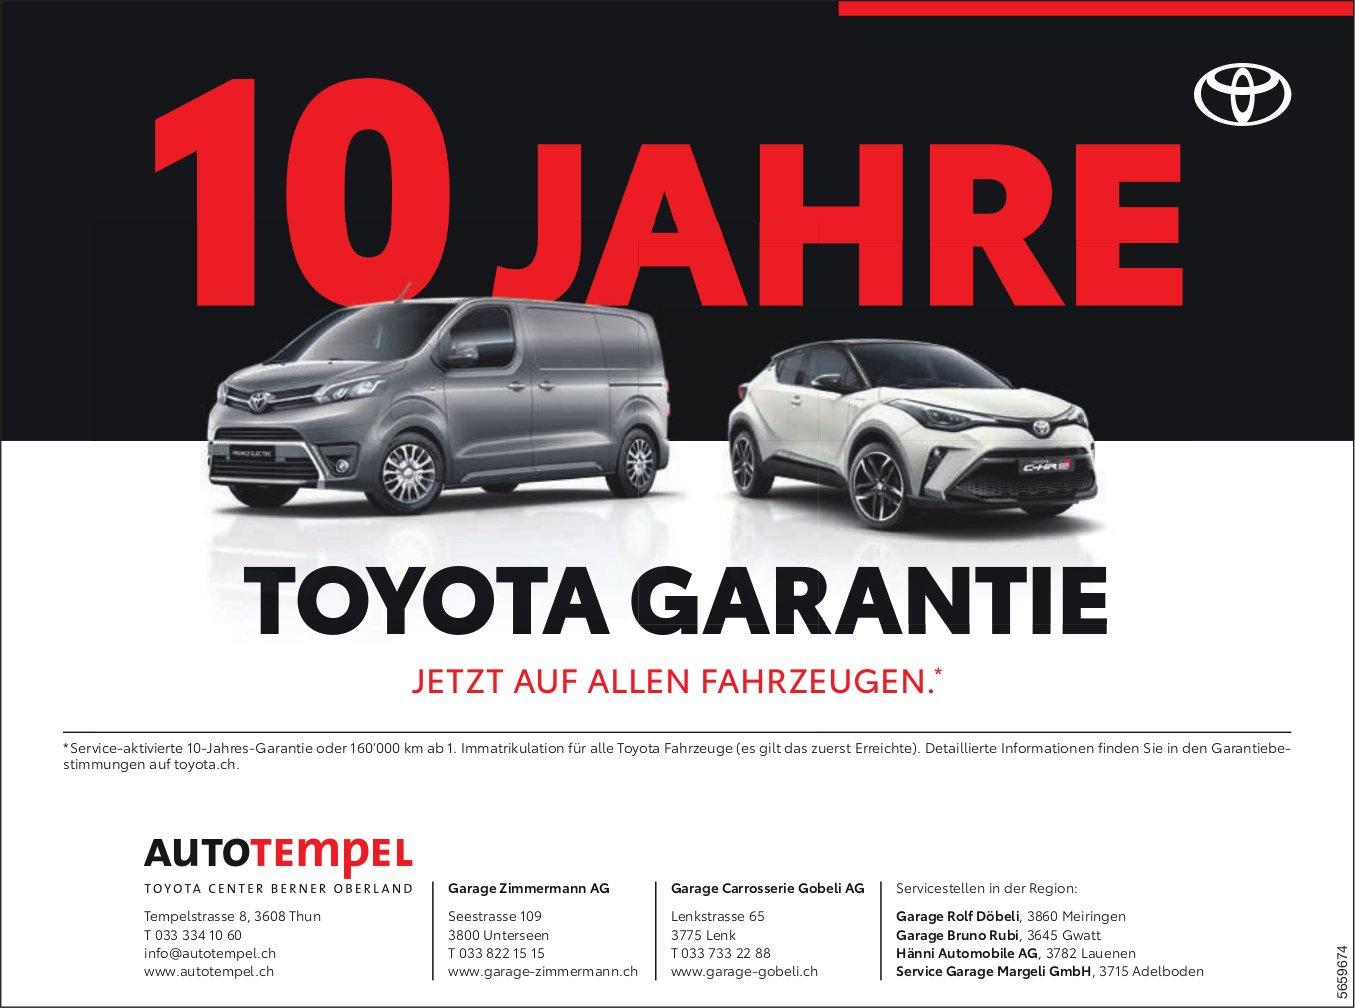 Autotempel AG, Thun - 10 Jahre Toyota Garantie